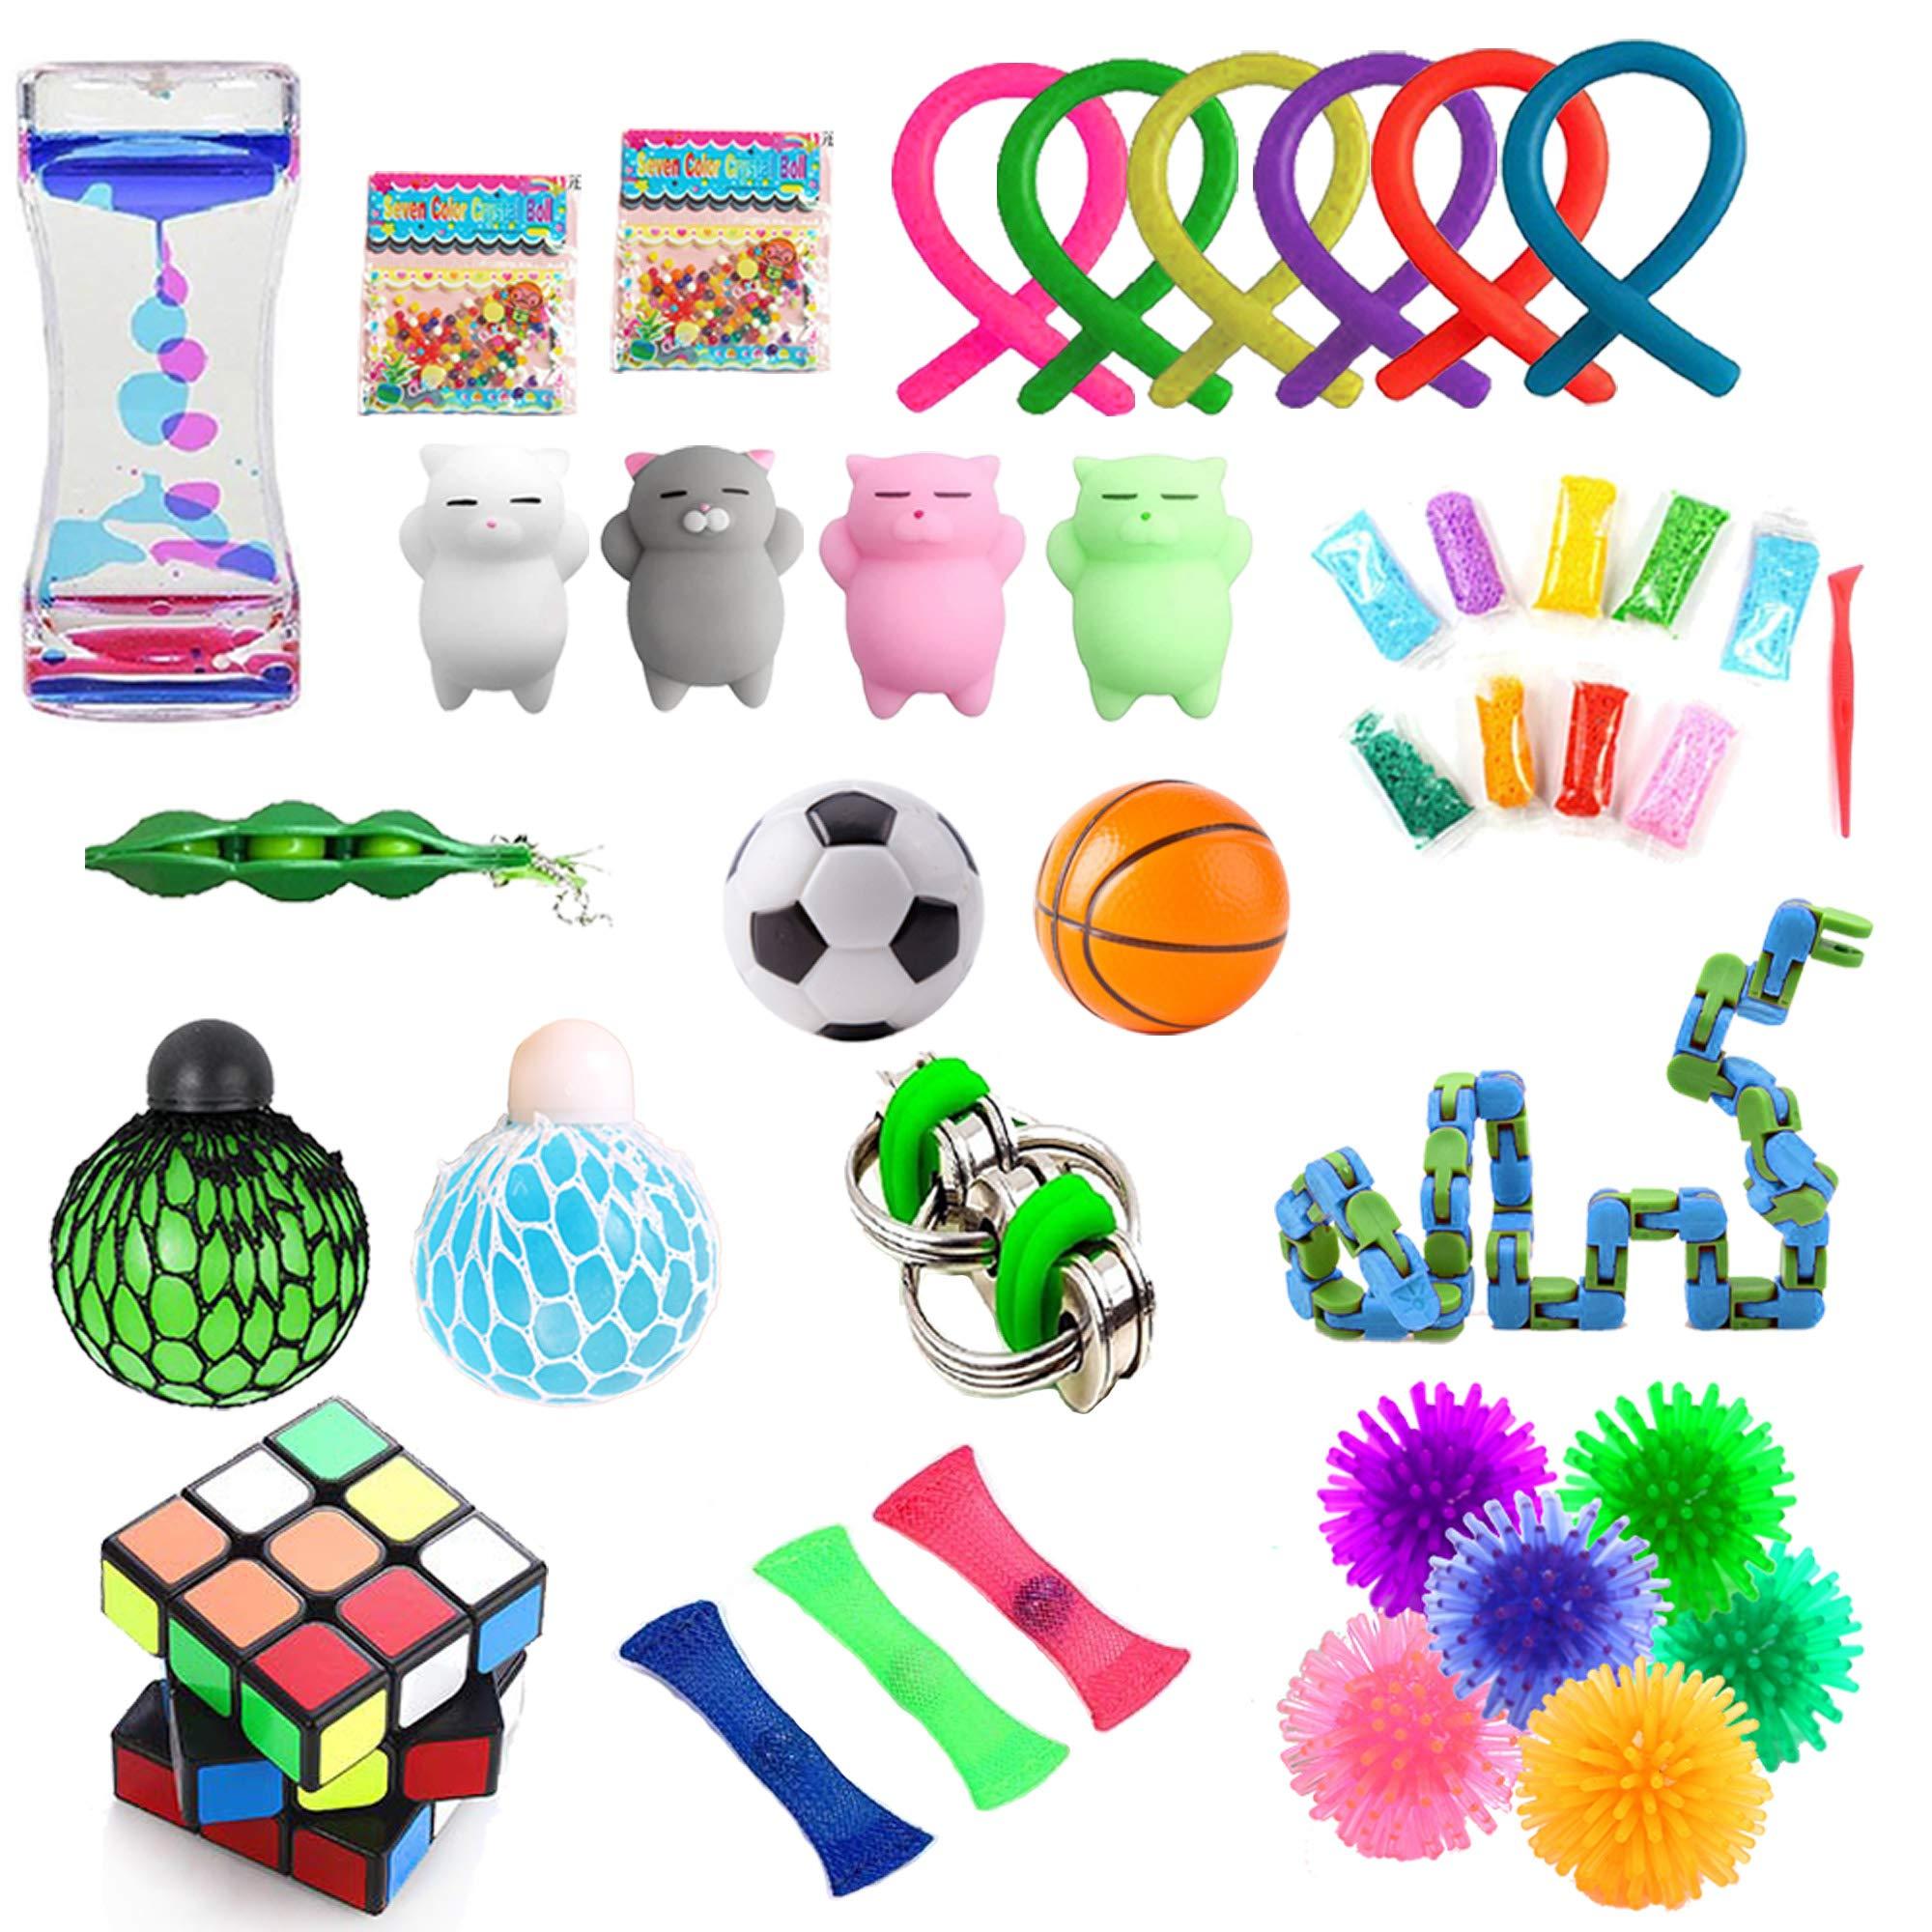 GONGYIHONG 40 Pack Sensory Fidget Toys Bundle, Fidget Cube/Liquid Motion Timer /Bike Chain/Soybeans Squeeze Grape Ball- Perfect for Kids&Adult…